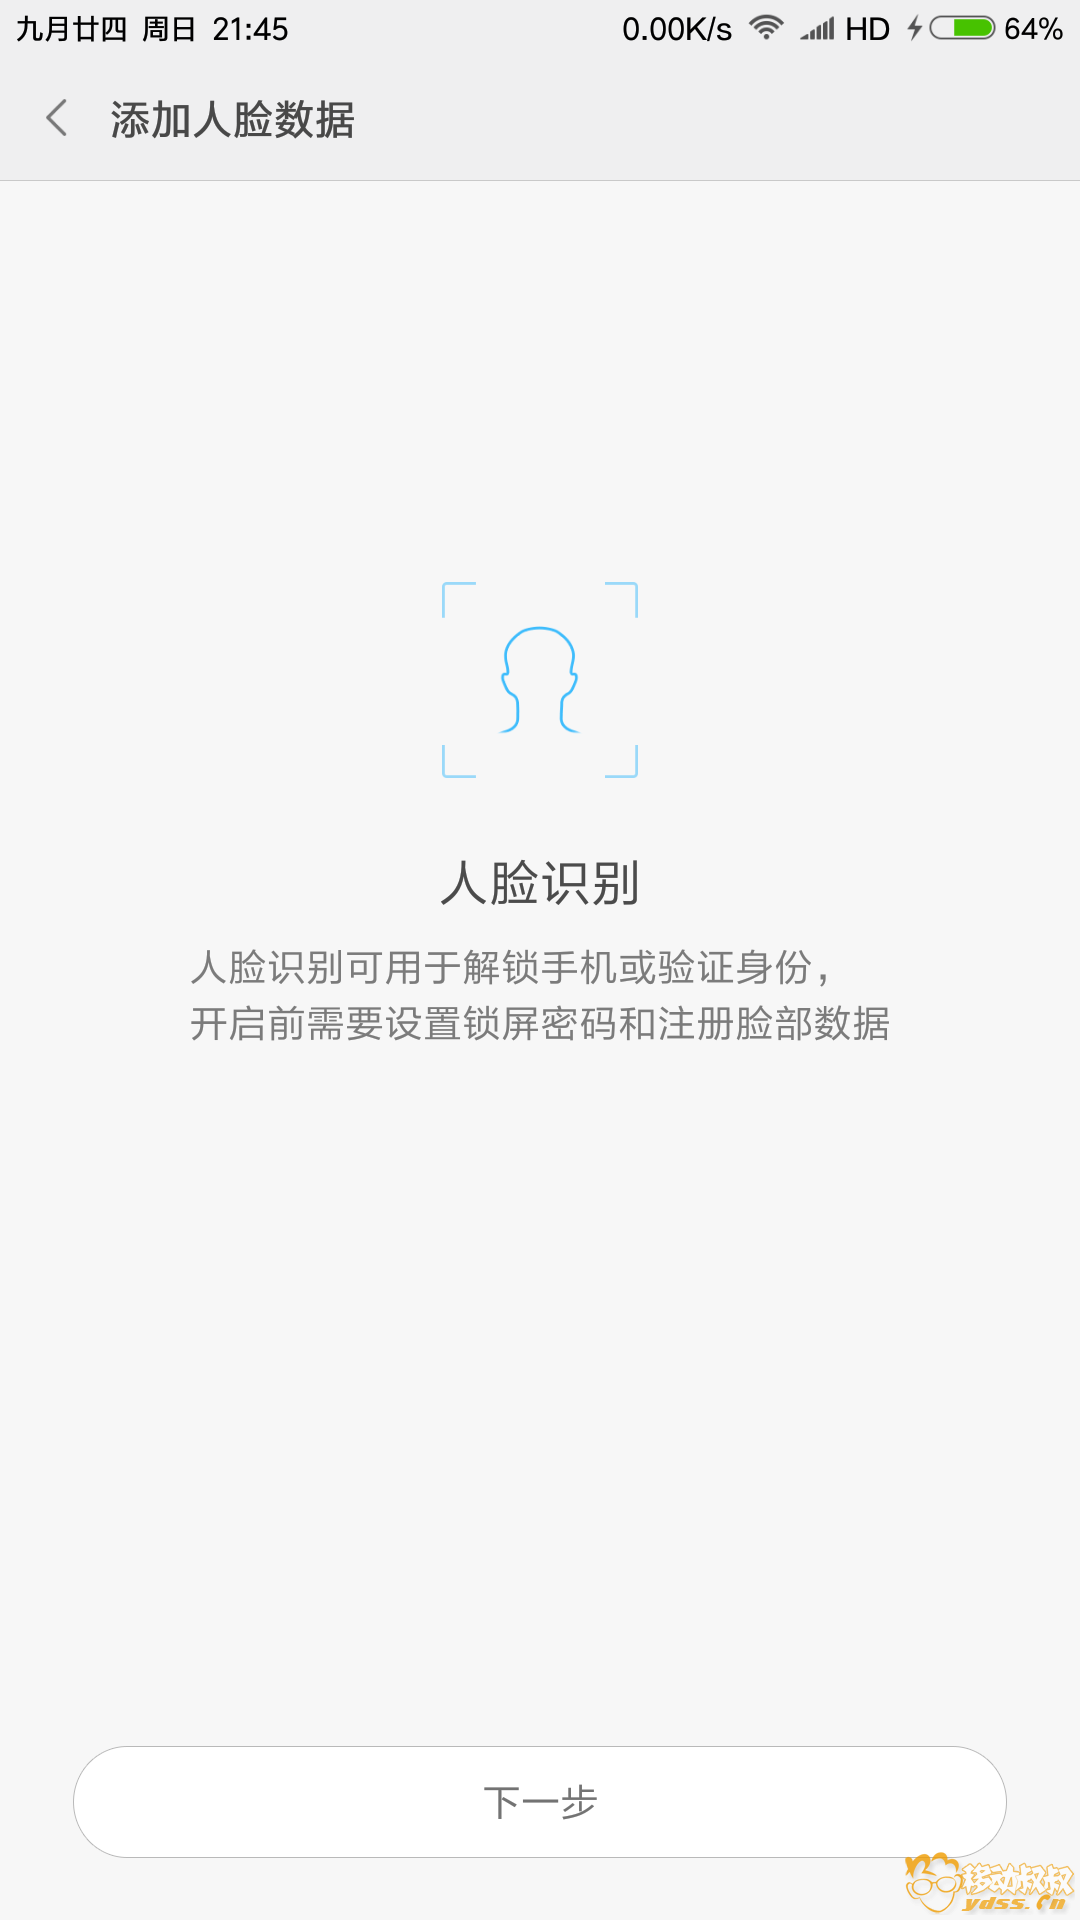 Screenshot_2017-11-12-21-45-41-329_com.android.keyguard.png